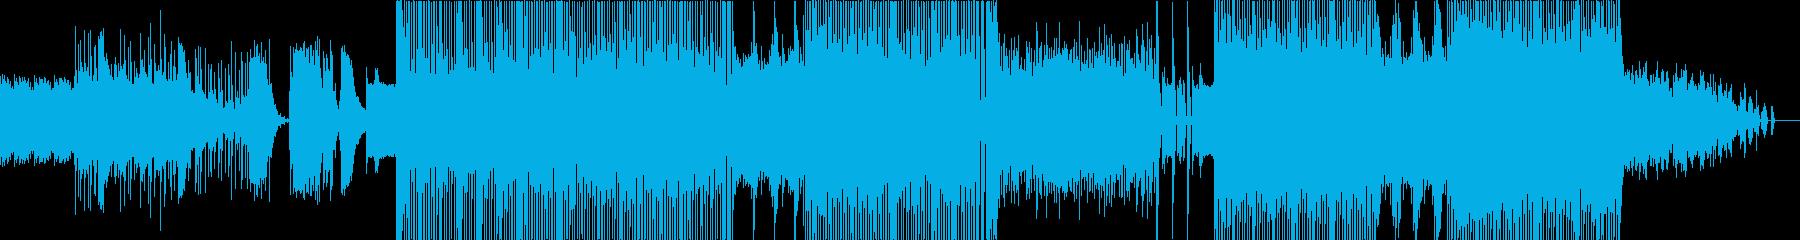 EL SANTOの再生済みの波形